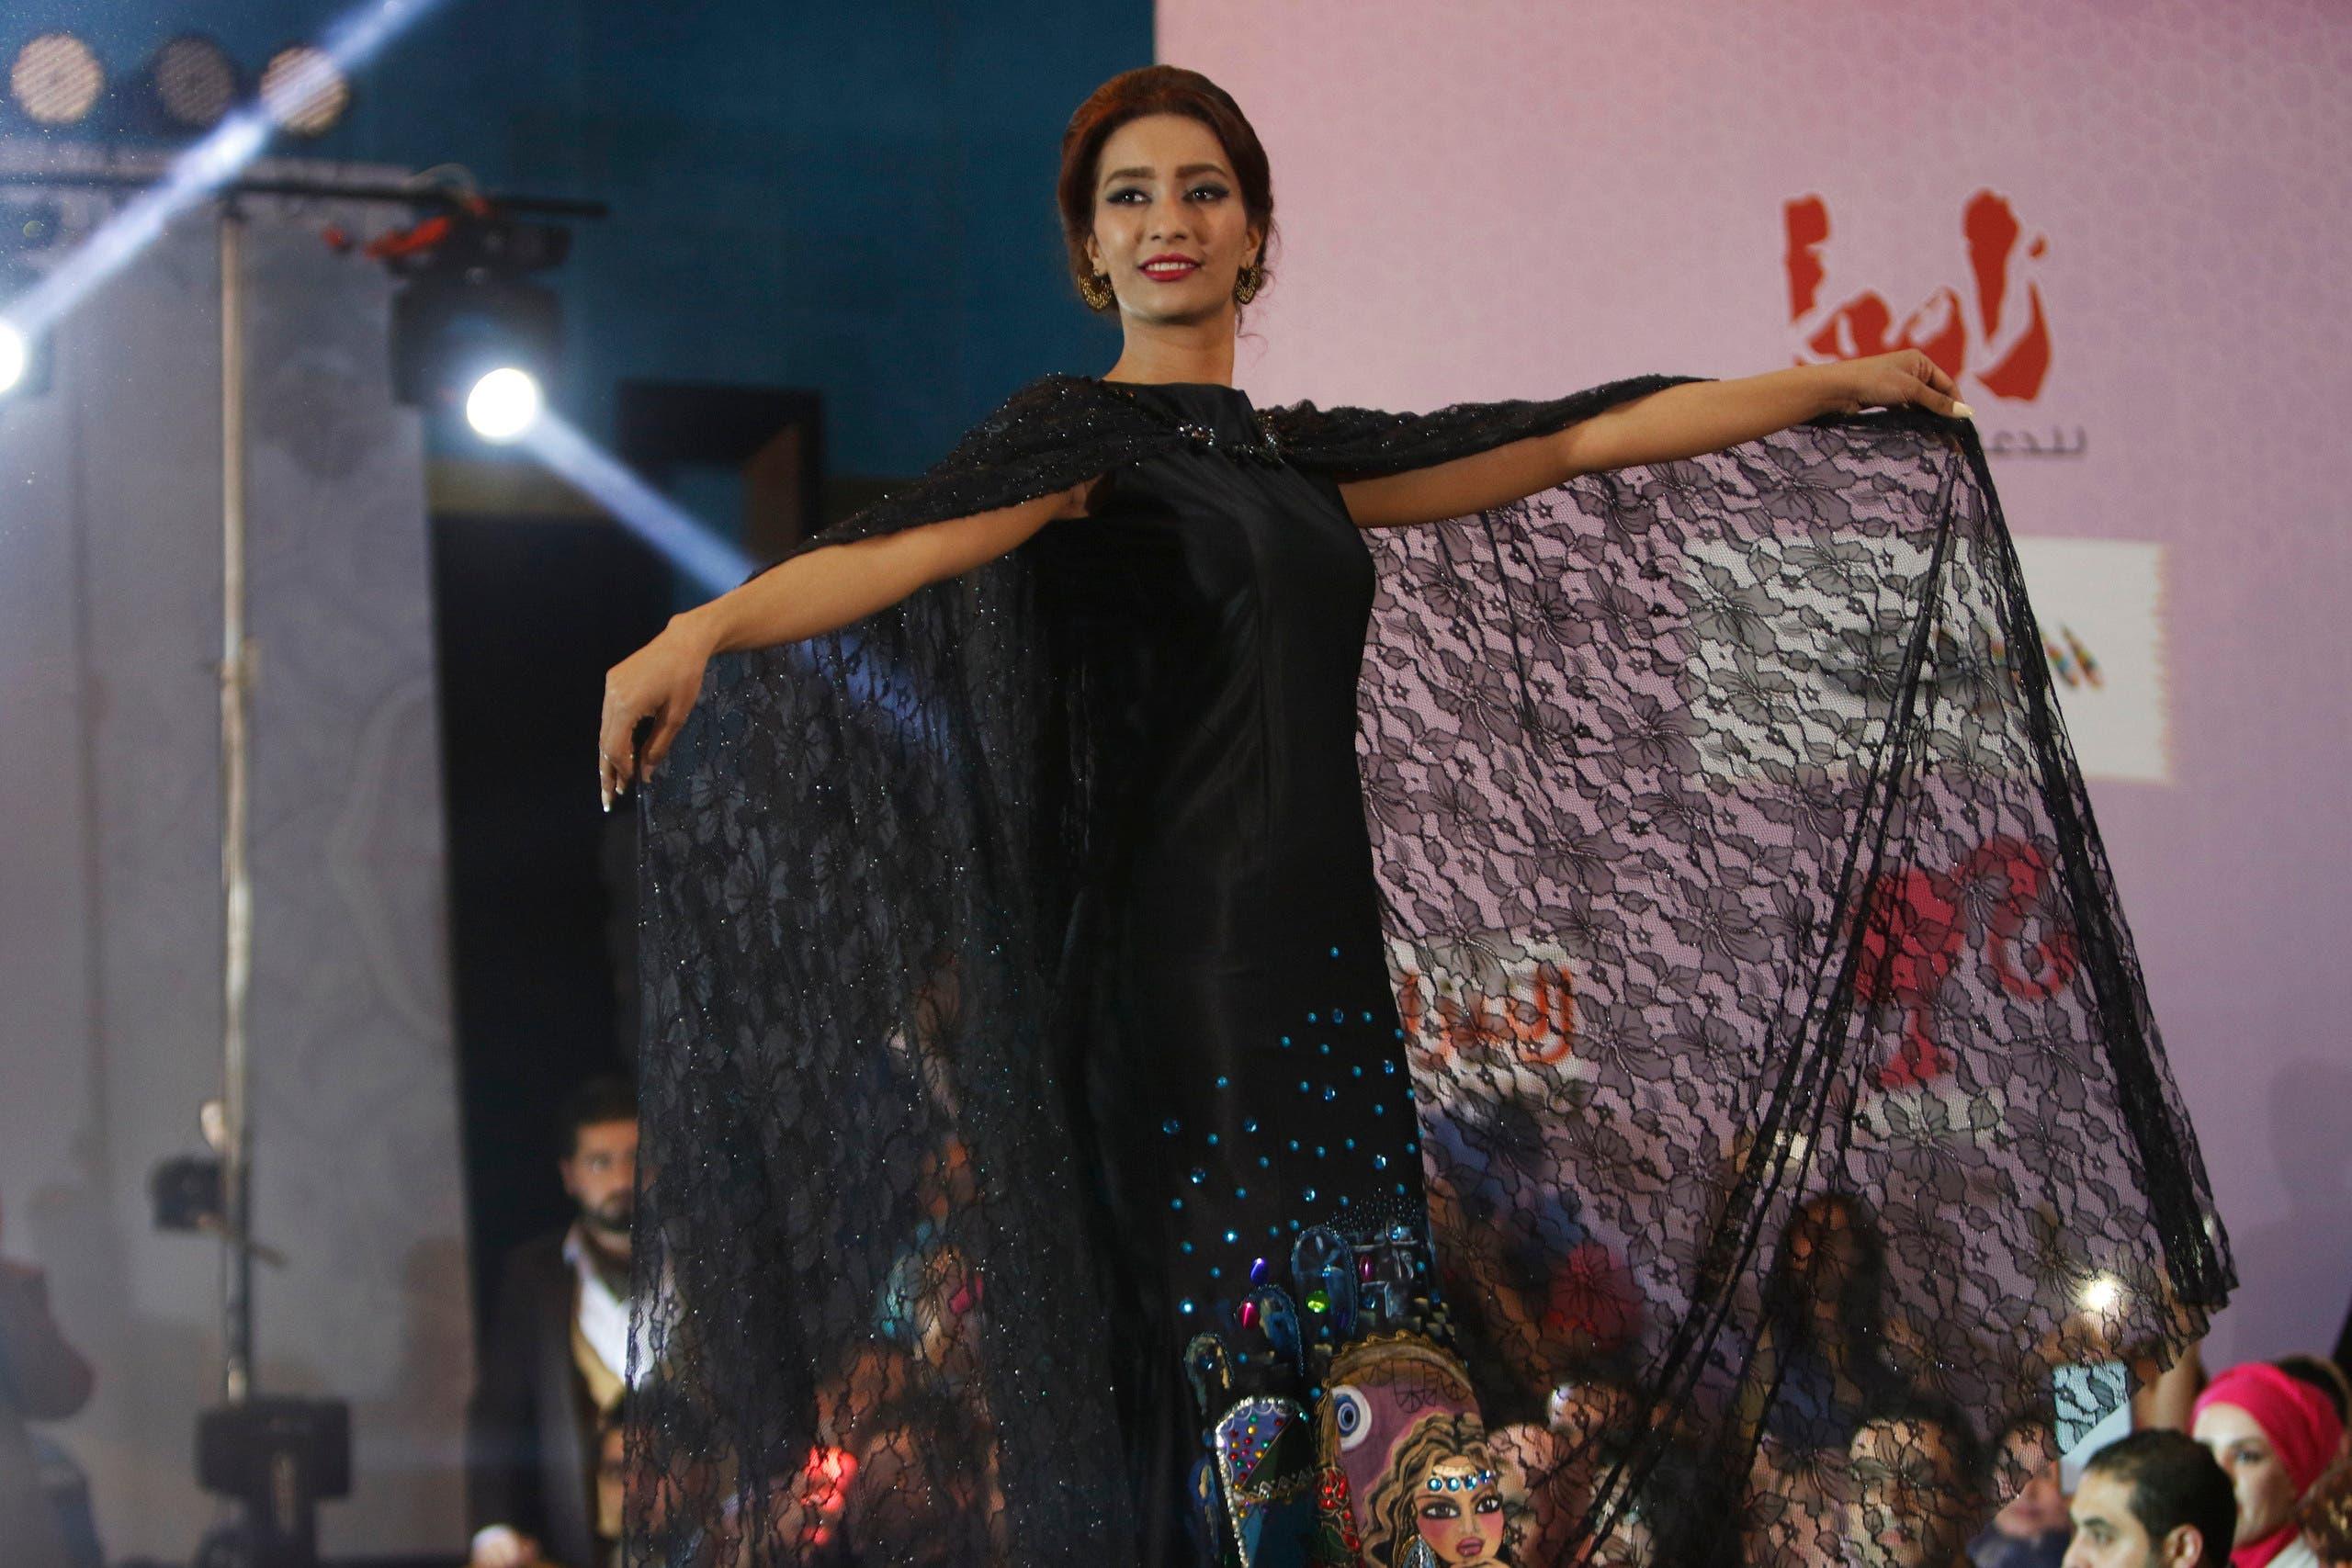 Forget ISIS: Iraqi models strut down the catwalk